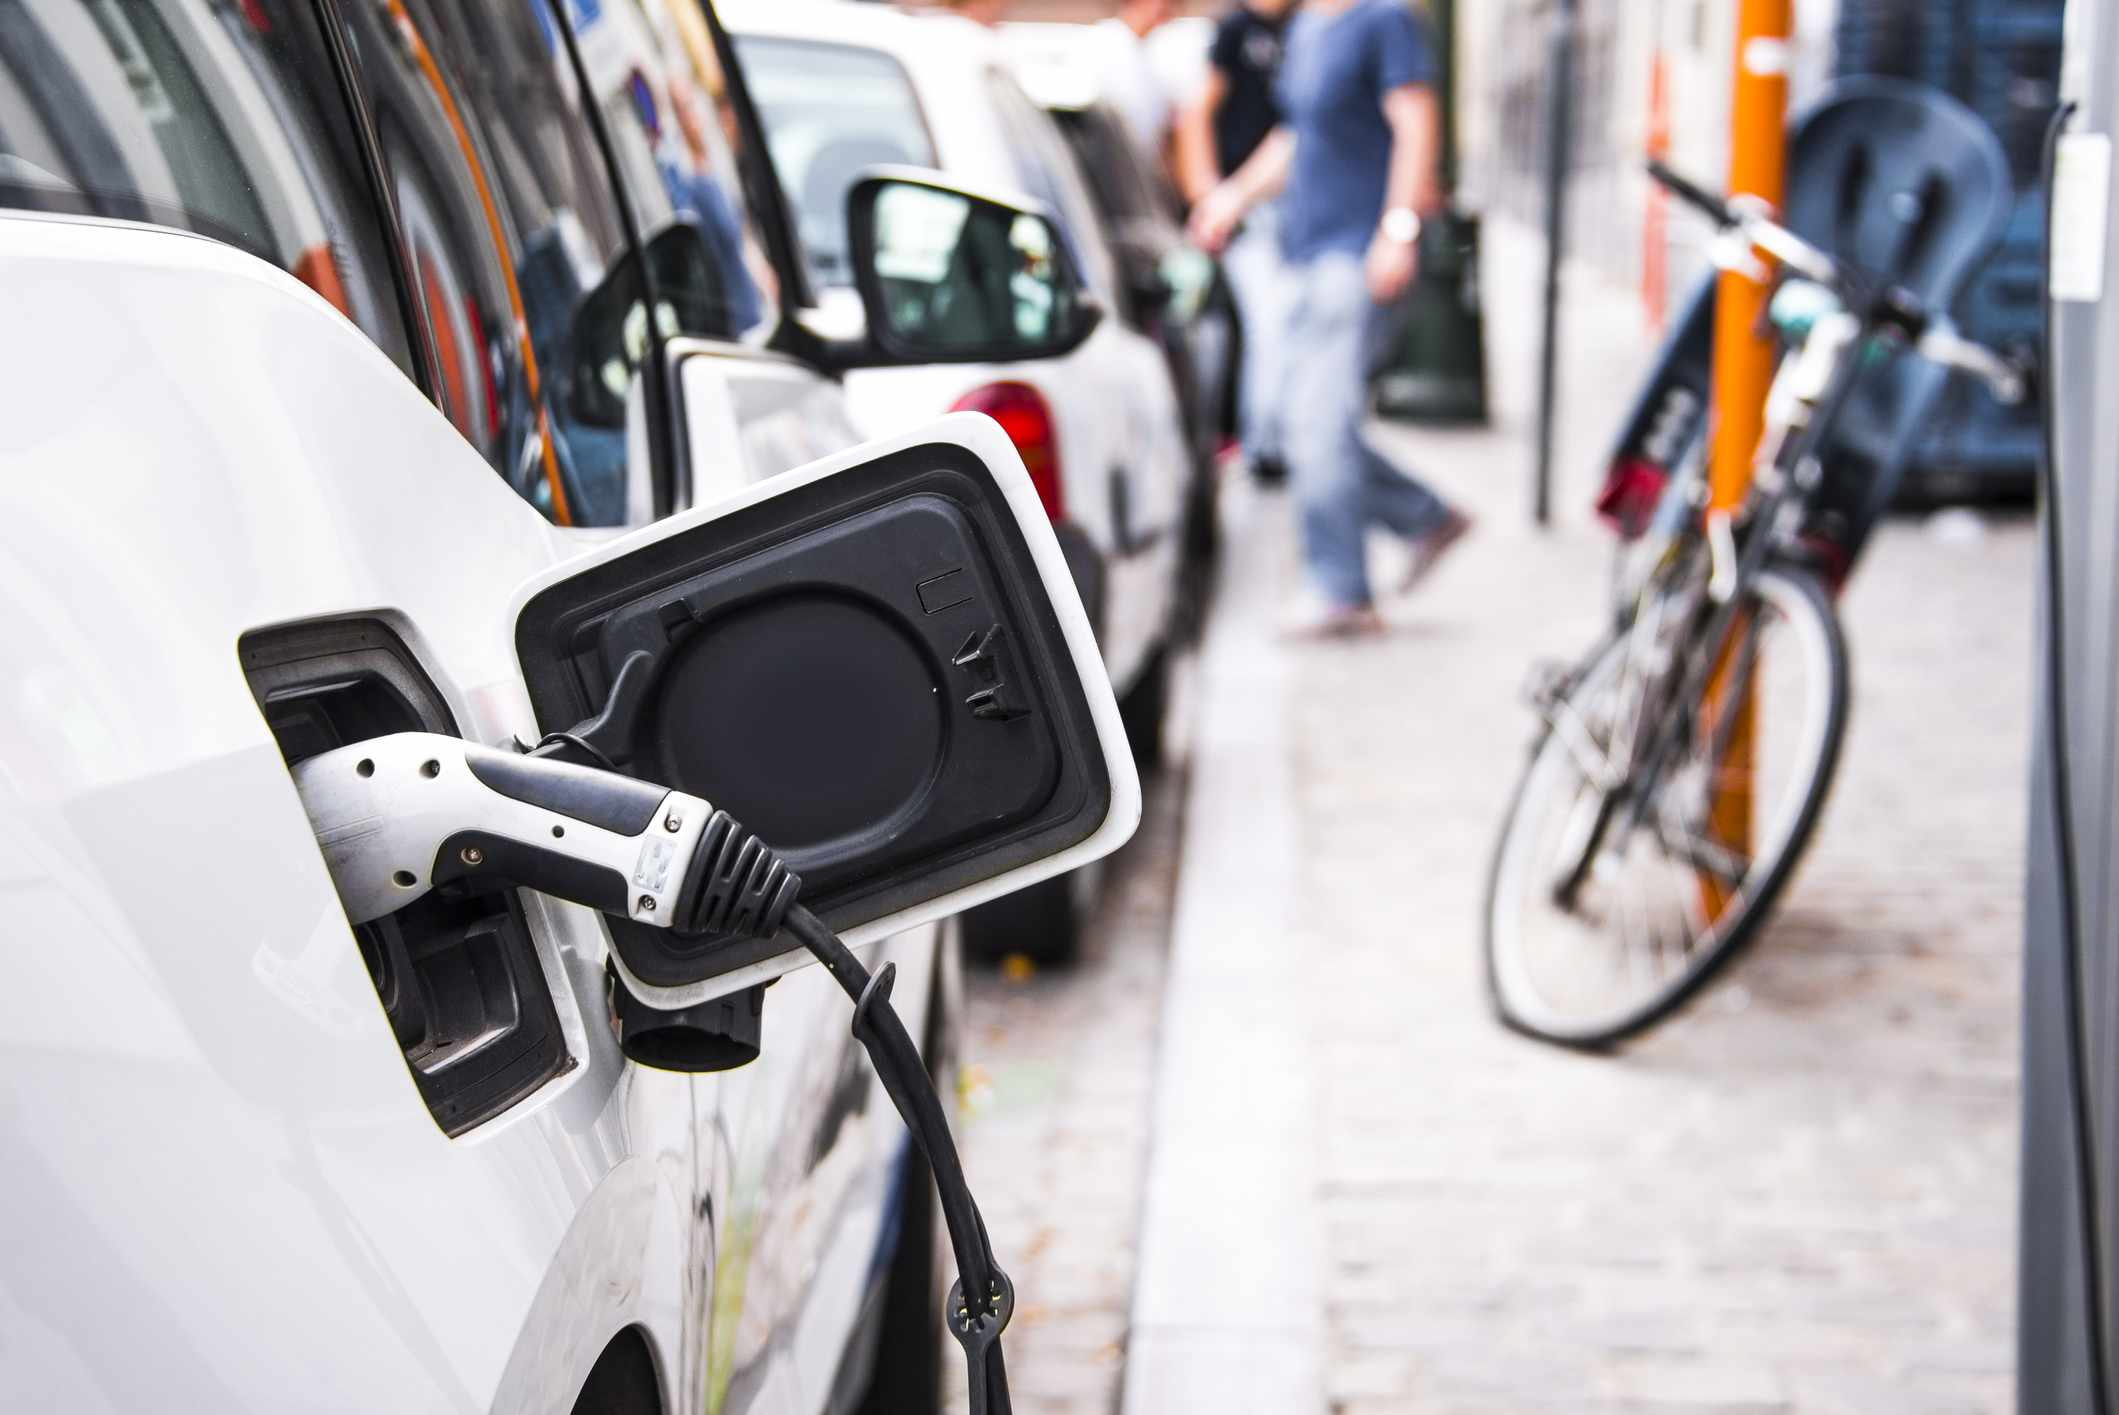 Electric vehicle plugged in on sidewalk